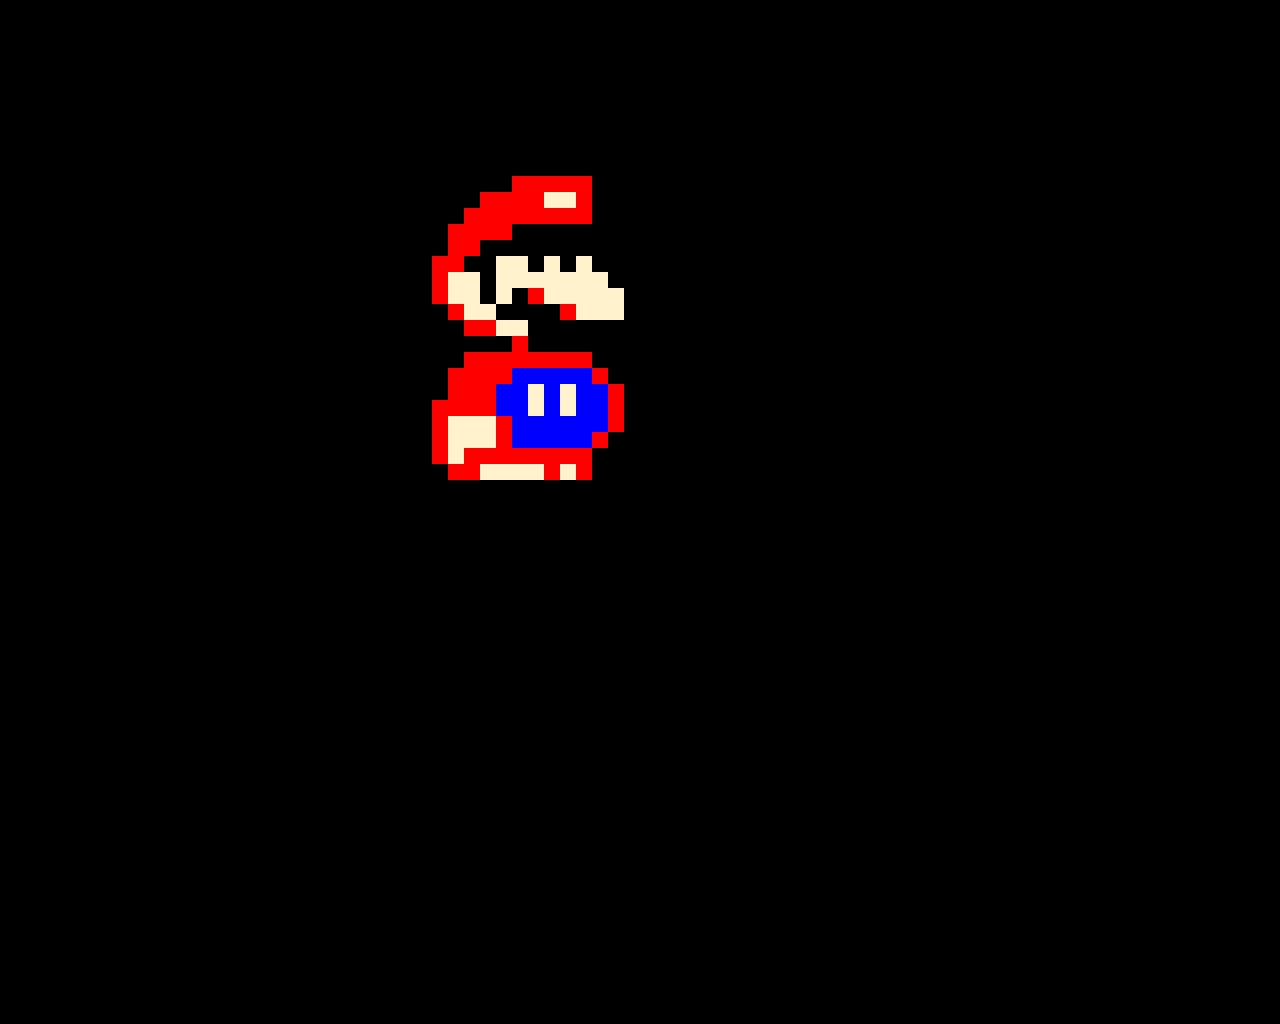 Mario from Super Mario World (For NES)